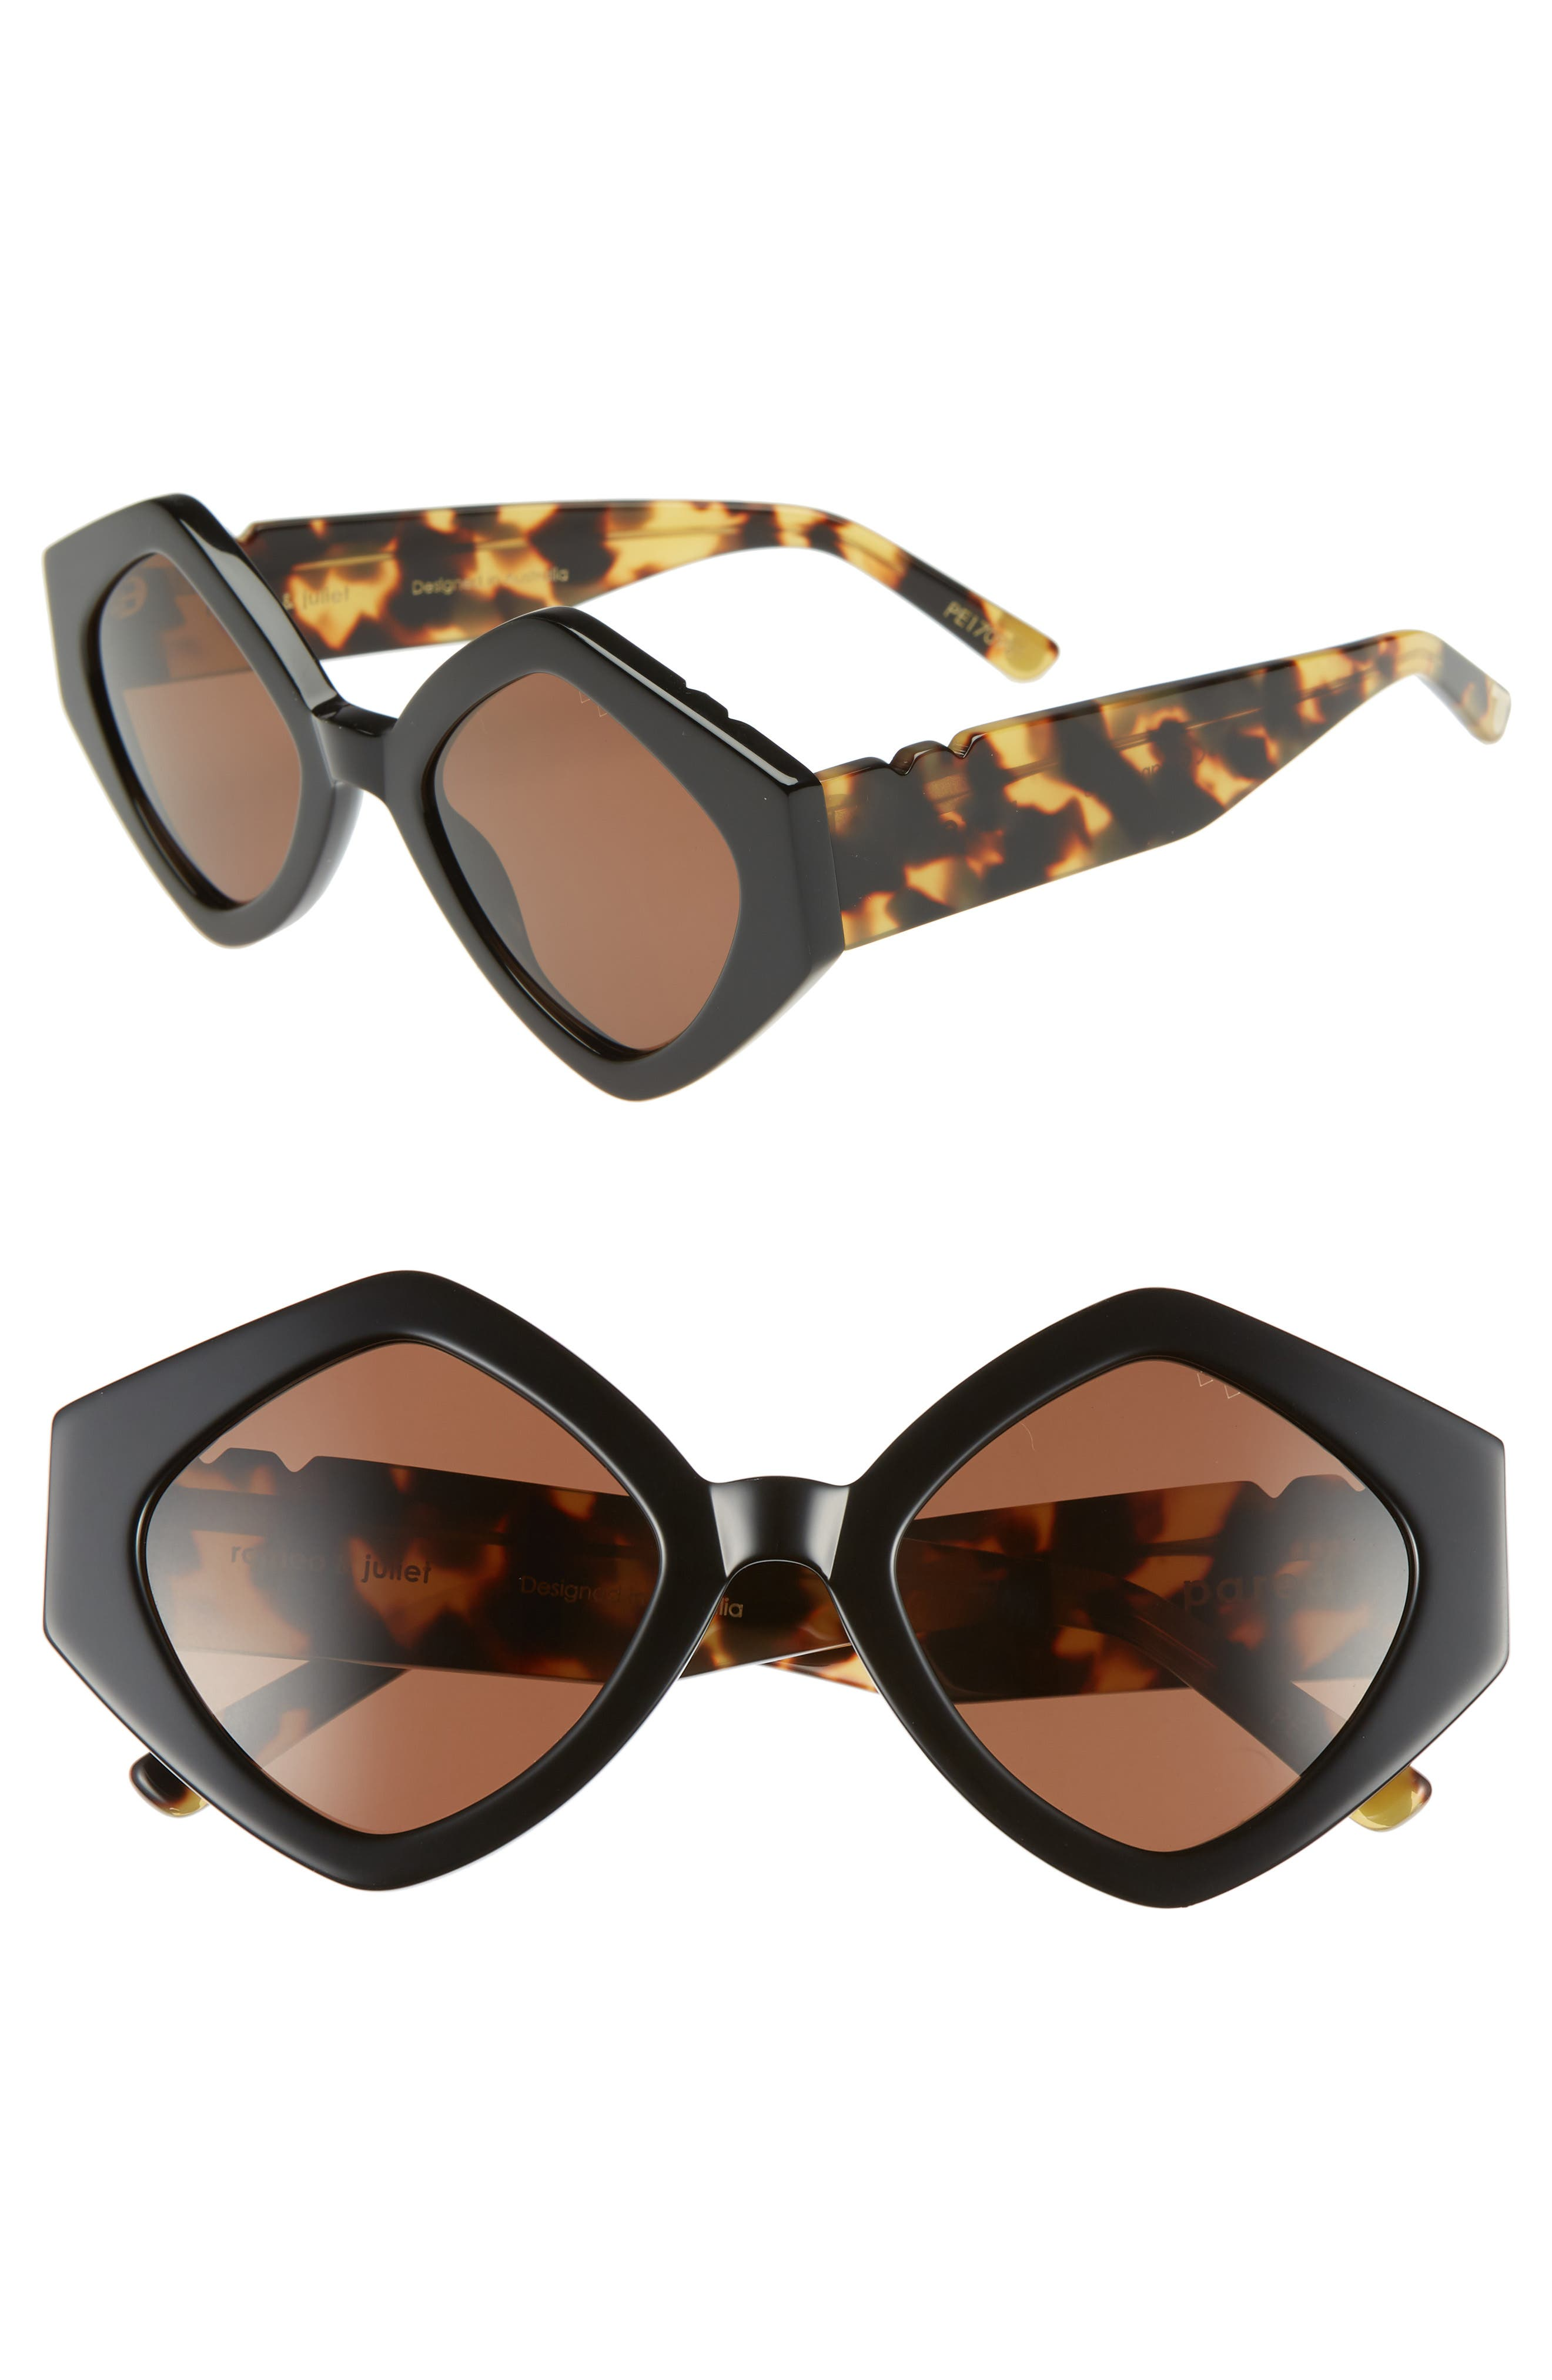 Romeo & Juliet 52mm Sunglasses,                             Main thumbnail 1, color,                             BLACK SOLID BROWN LENSES